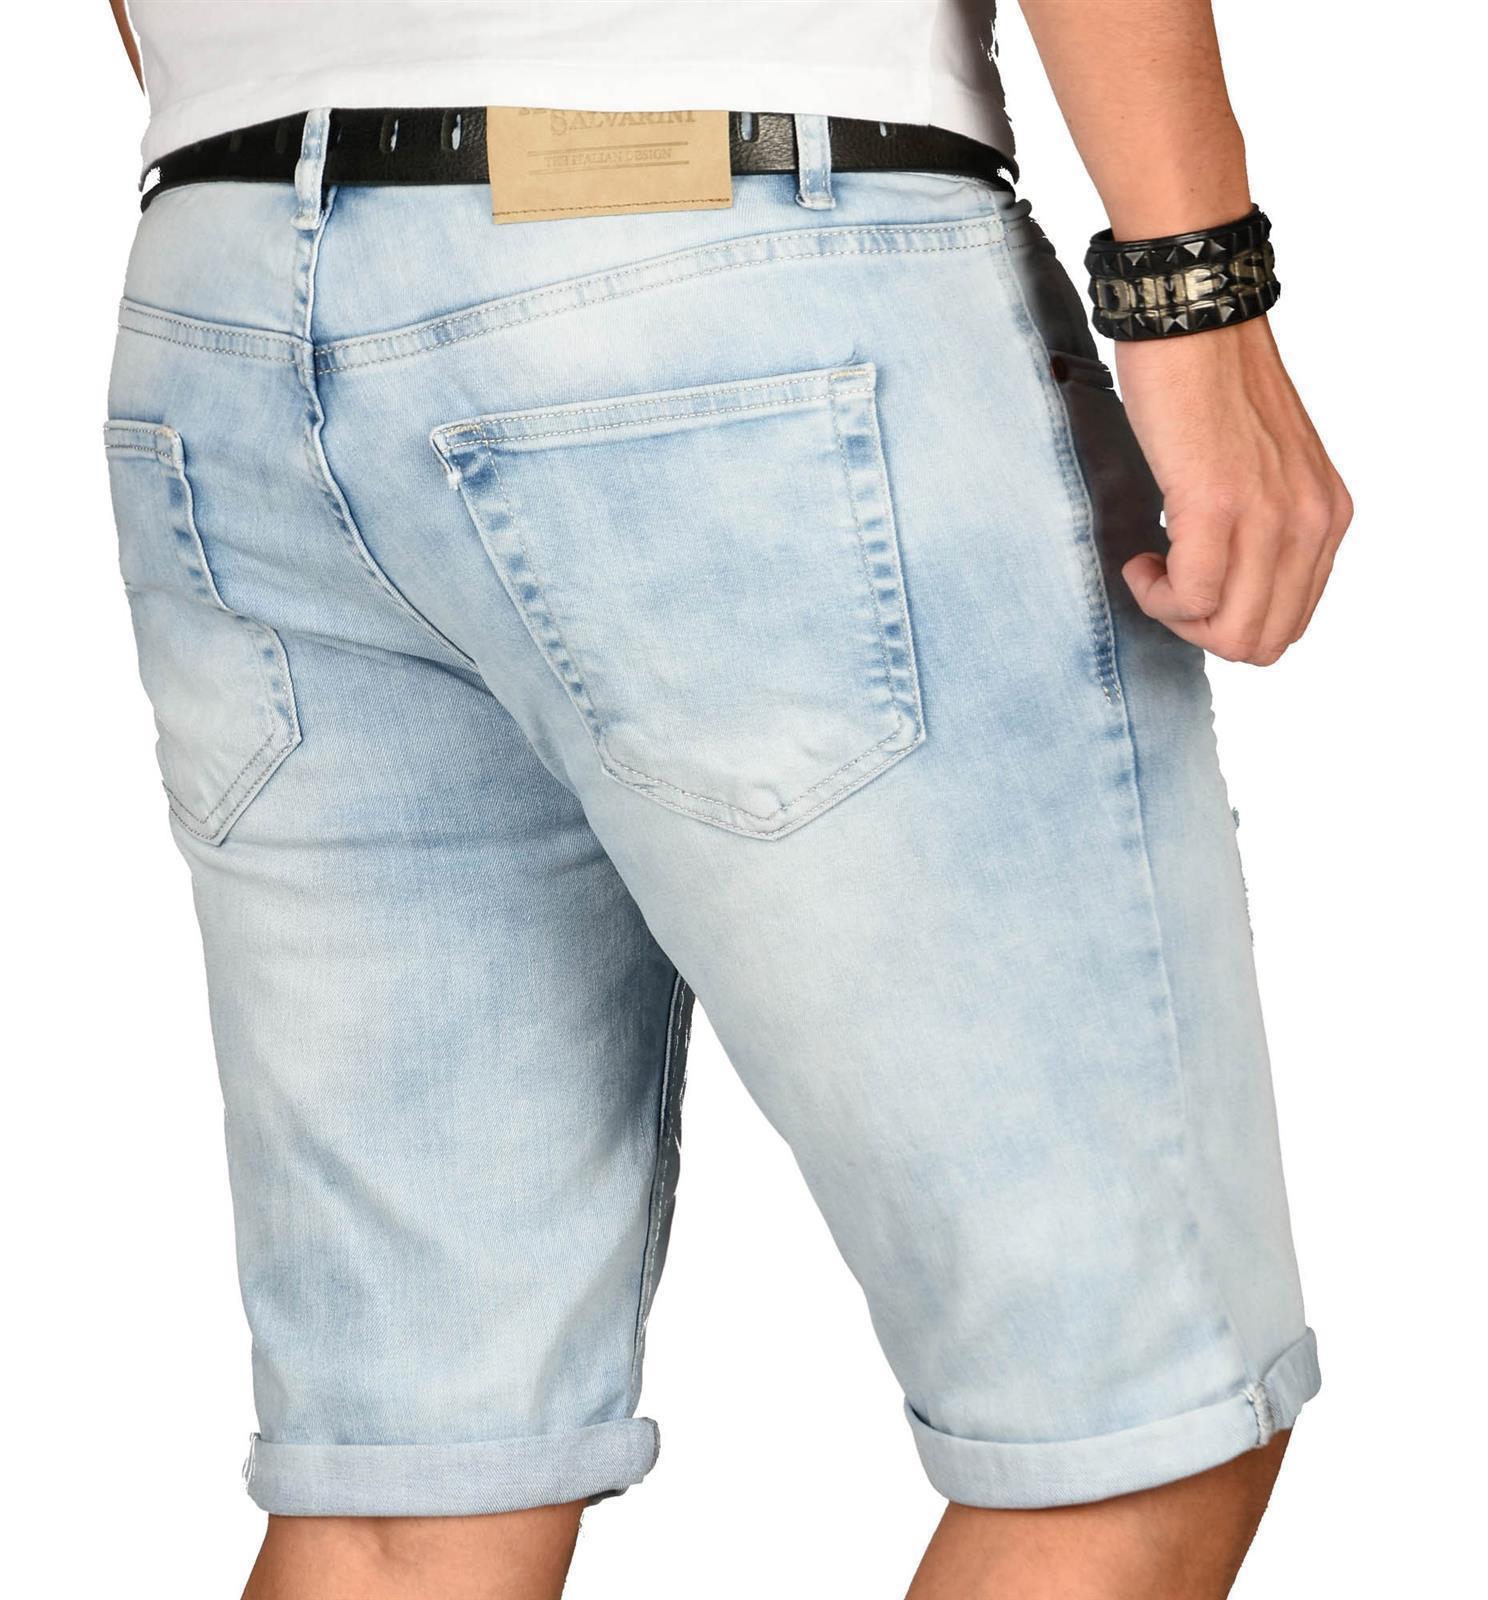 A-Salvarini-Herren-Designer-Jeans-Short-kurze-Hose-Slim-Sommer-Shorts-Washed Indexbild 12